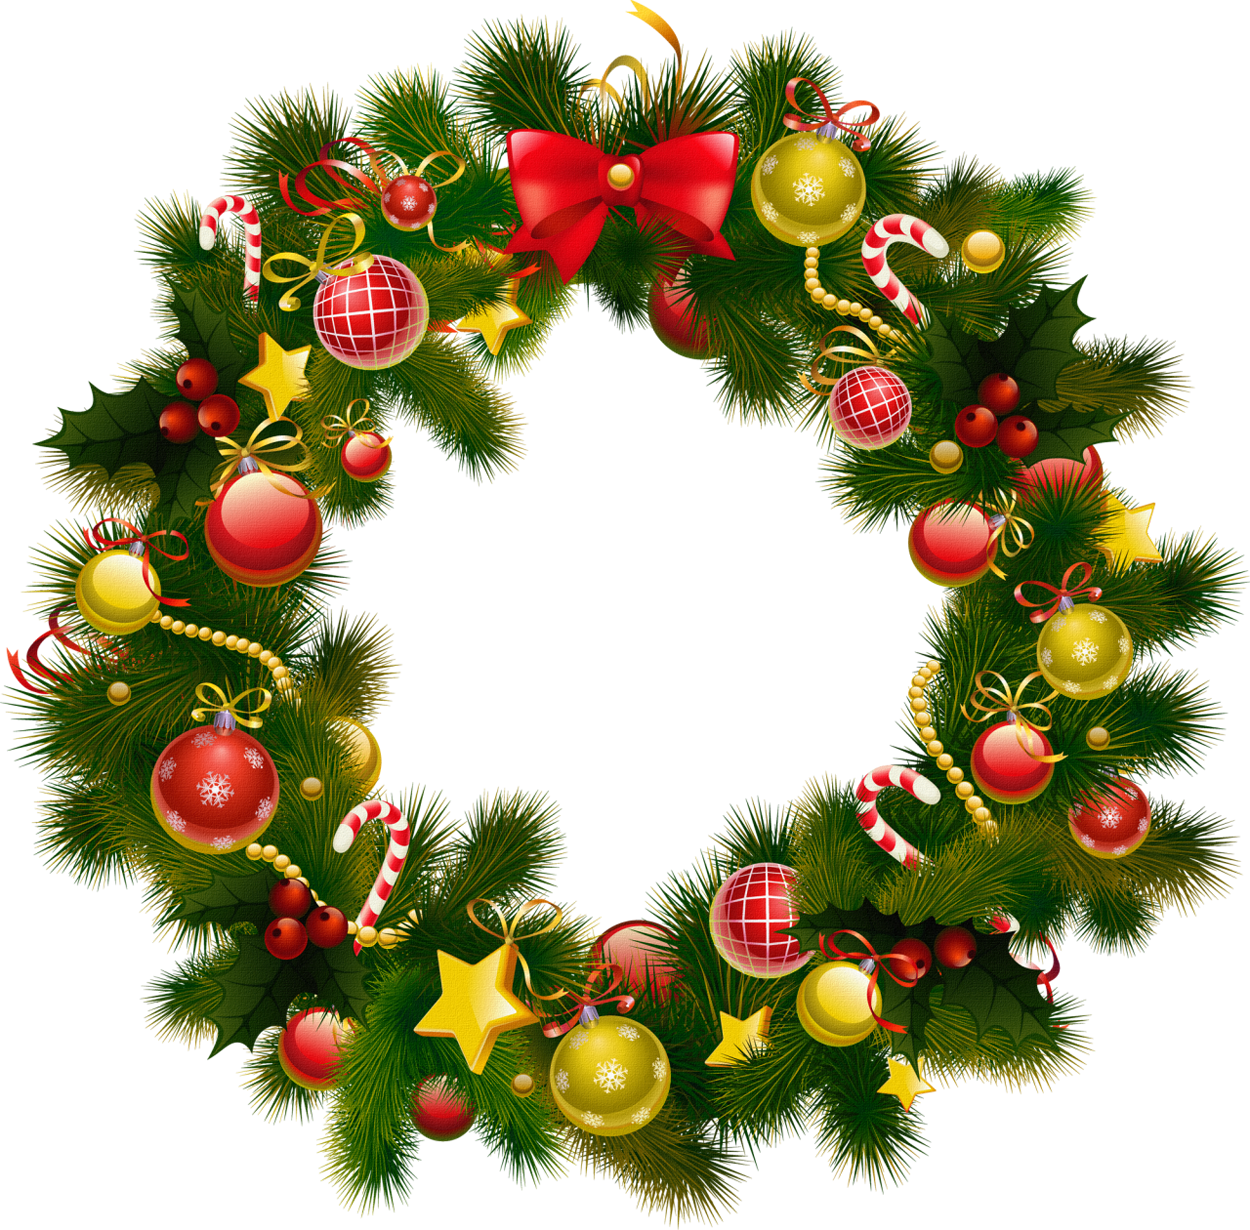 Christmas Wreath Clipart No Background Google Search Christmas Wreath Clipart Easy Christmas Wreaths Christmas Wreaths